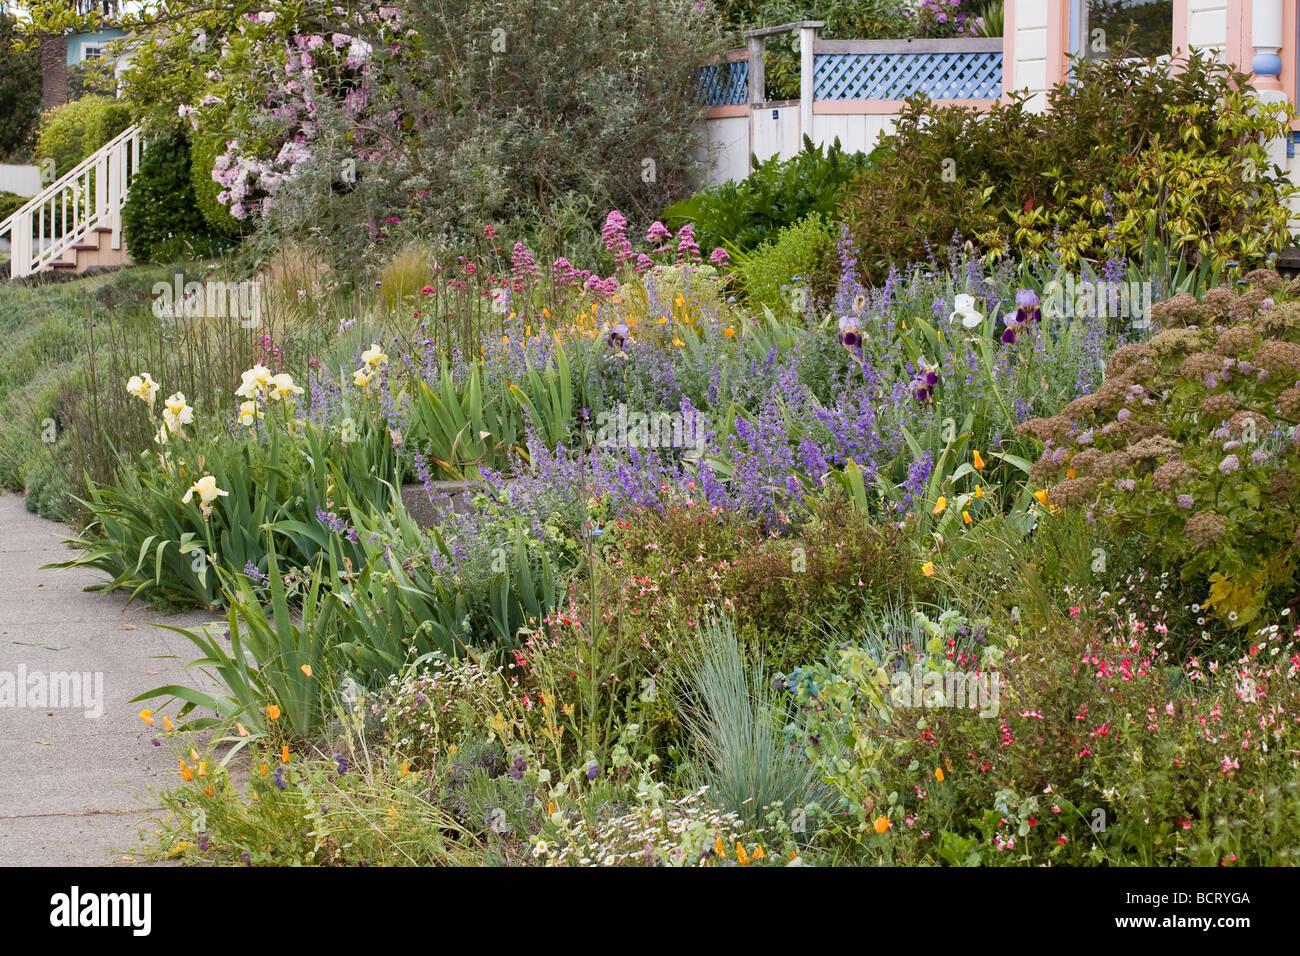 Great Amy Stewart S Front Yard Flowery No Lawn Cottage Garden In Eureka California